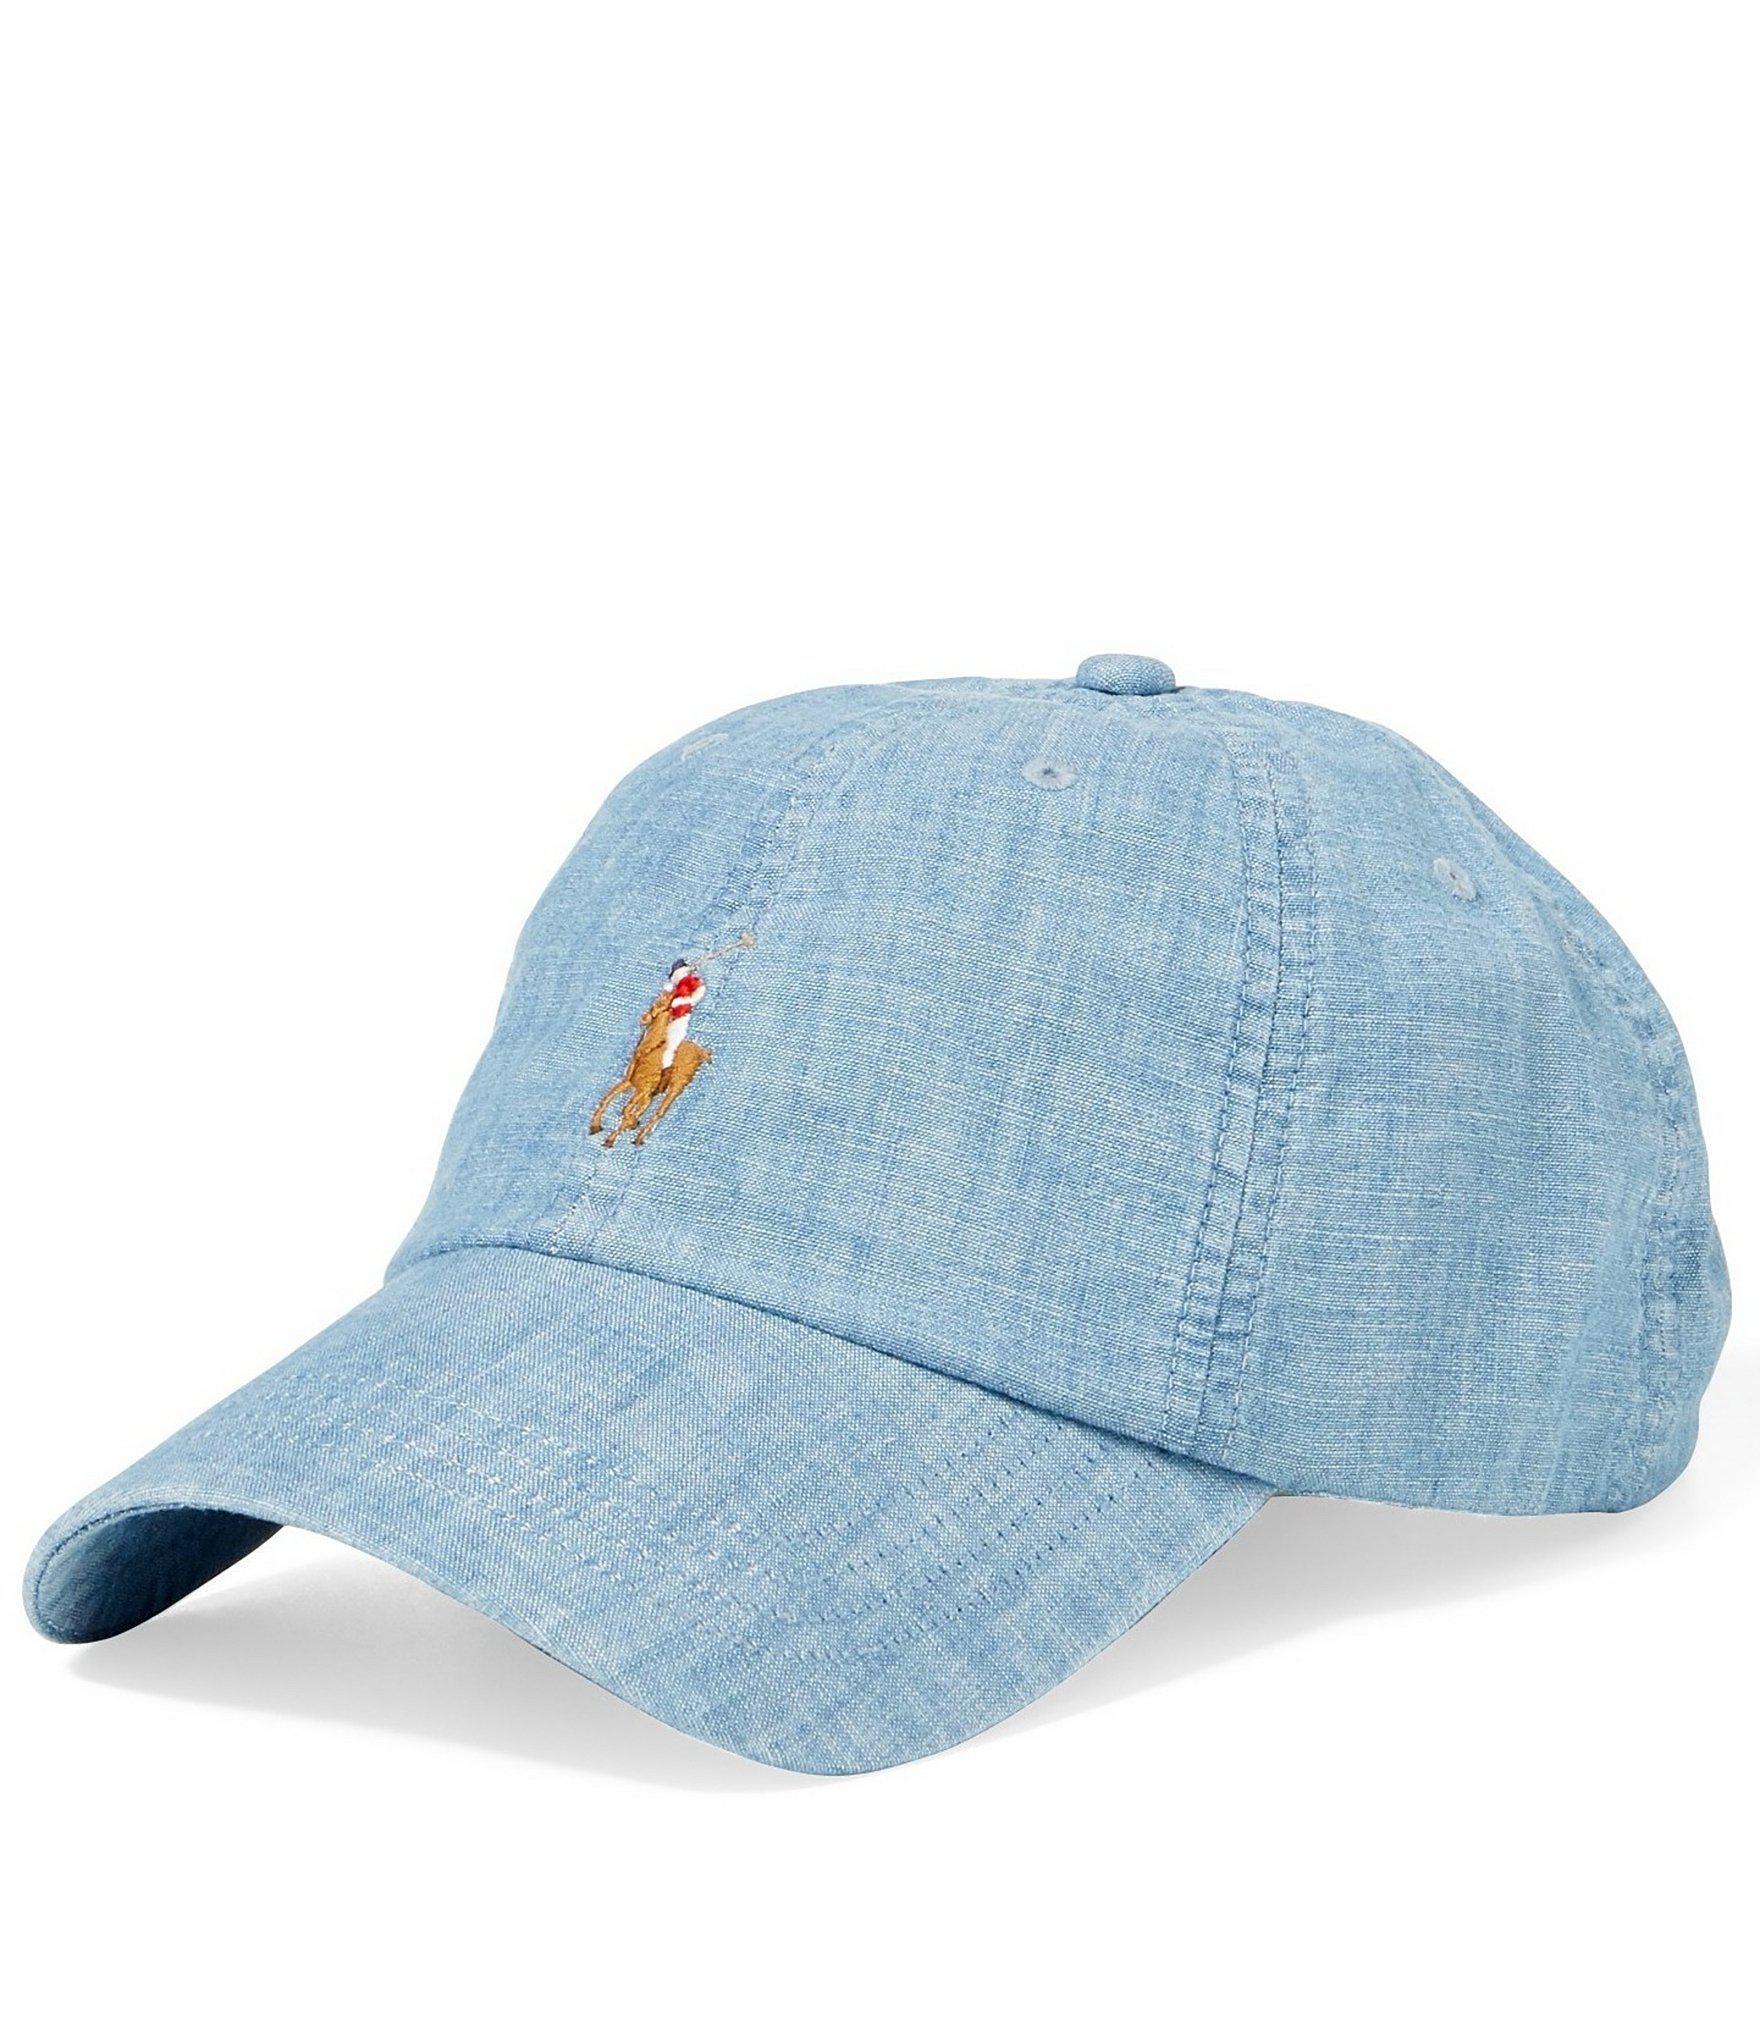 2d40613e350 Lyst - Polo Ralph Lauren Classic Baseball Cap in Blue for Men